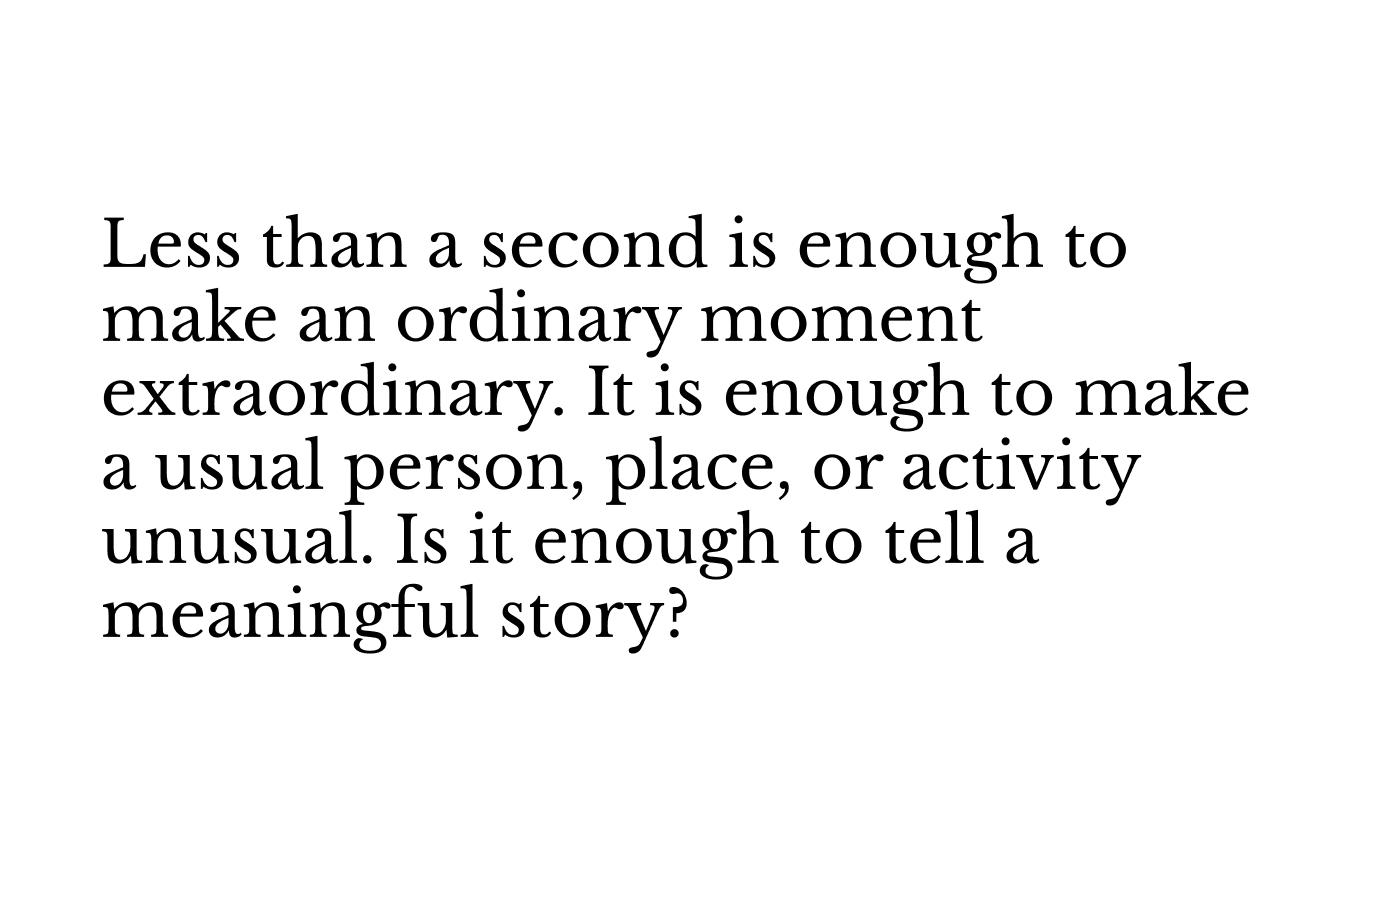 less-than-a-second.jpg